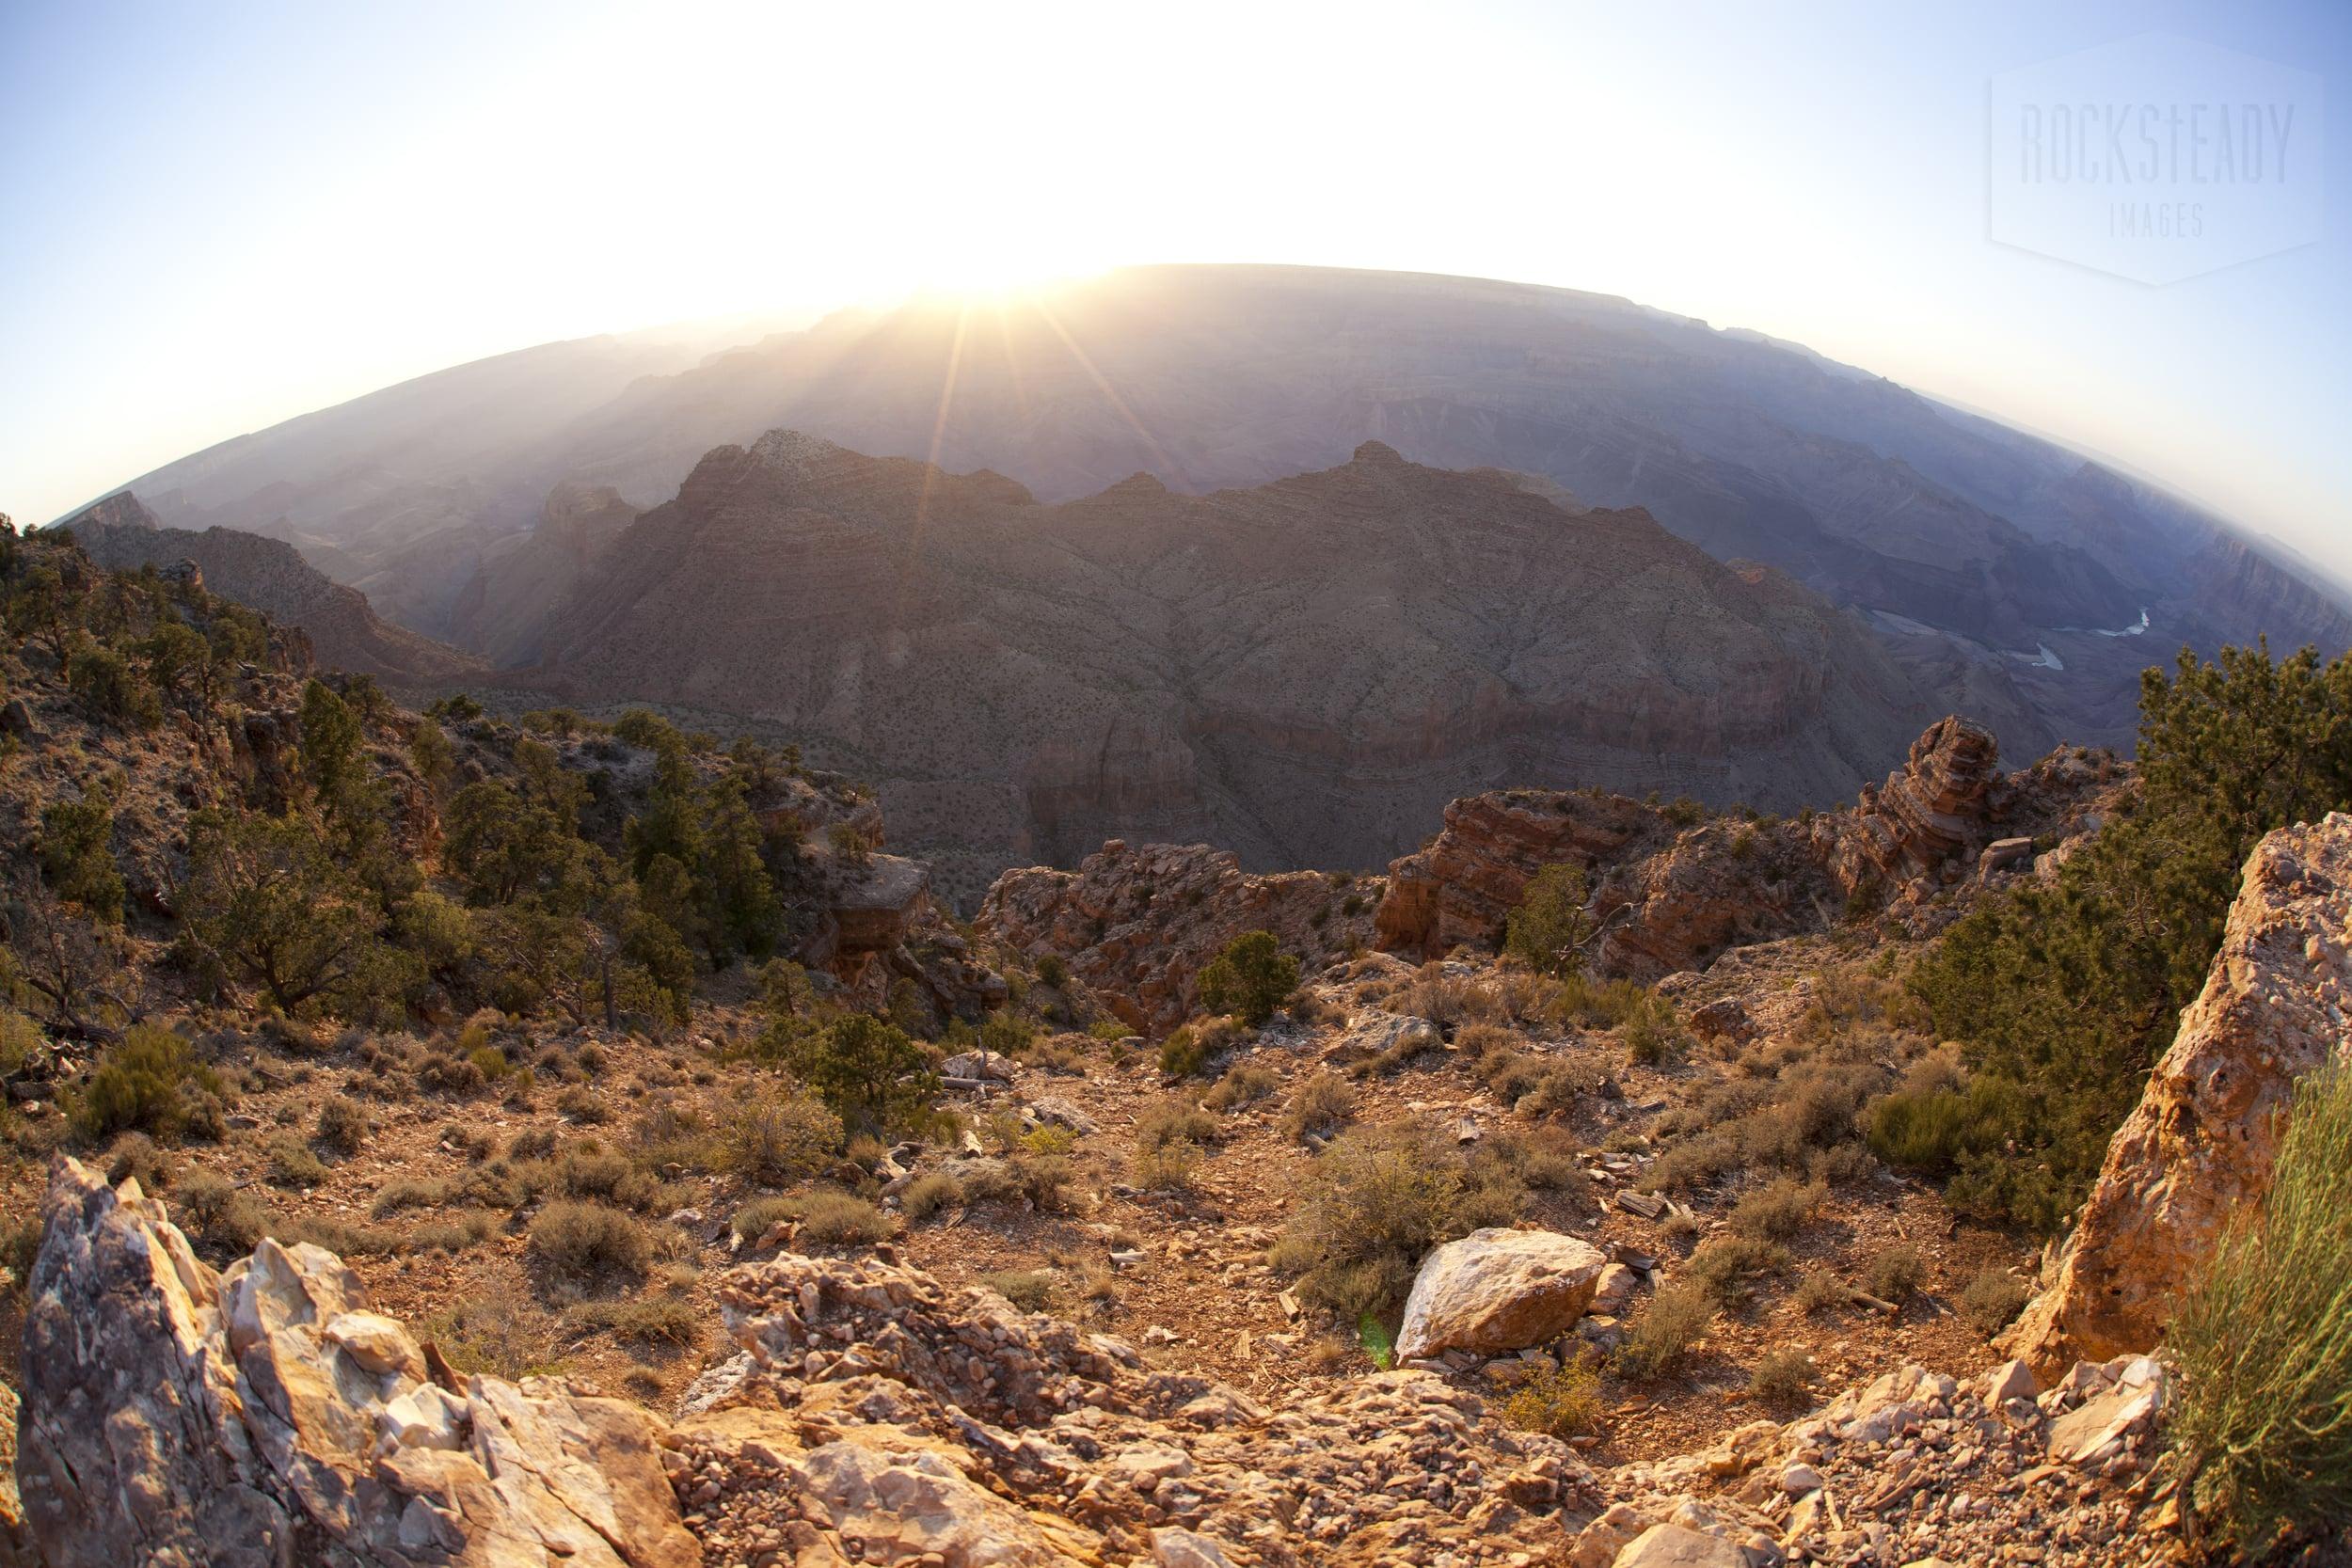 ROCKSTEADY IMAGES [Arizona] IMG_4602.jpg